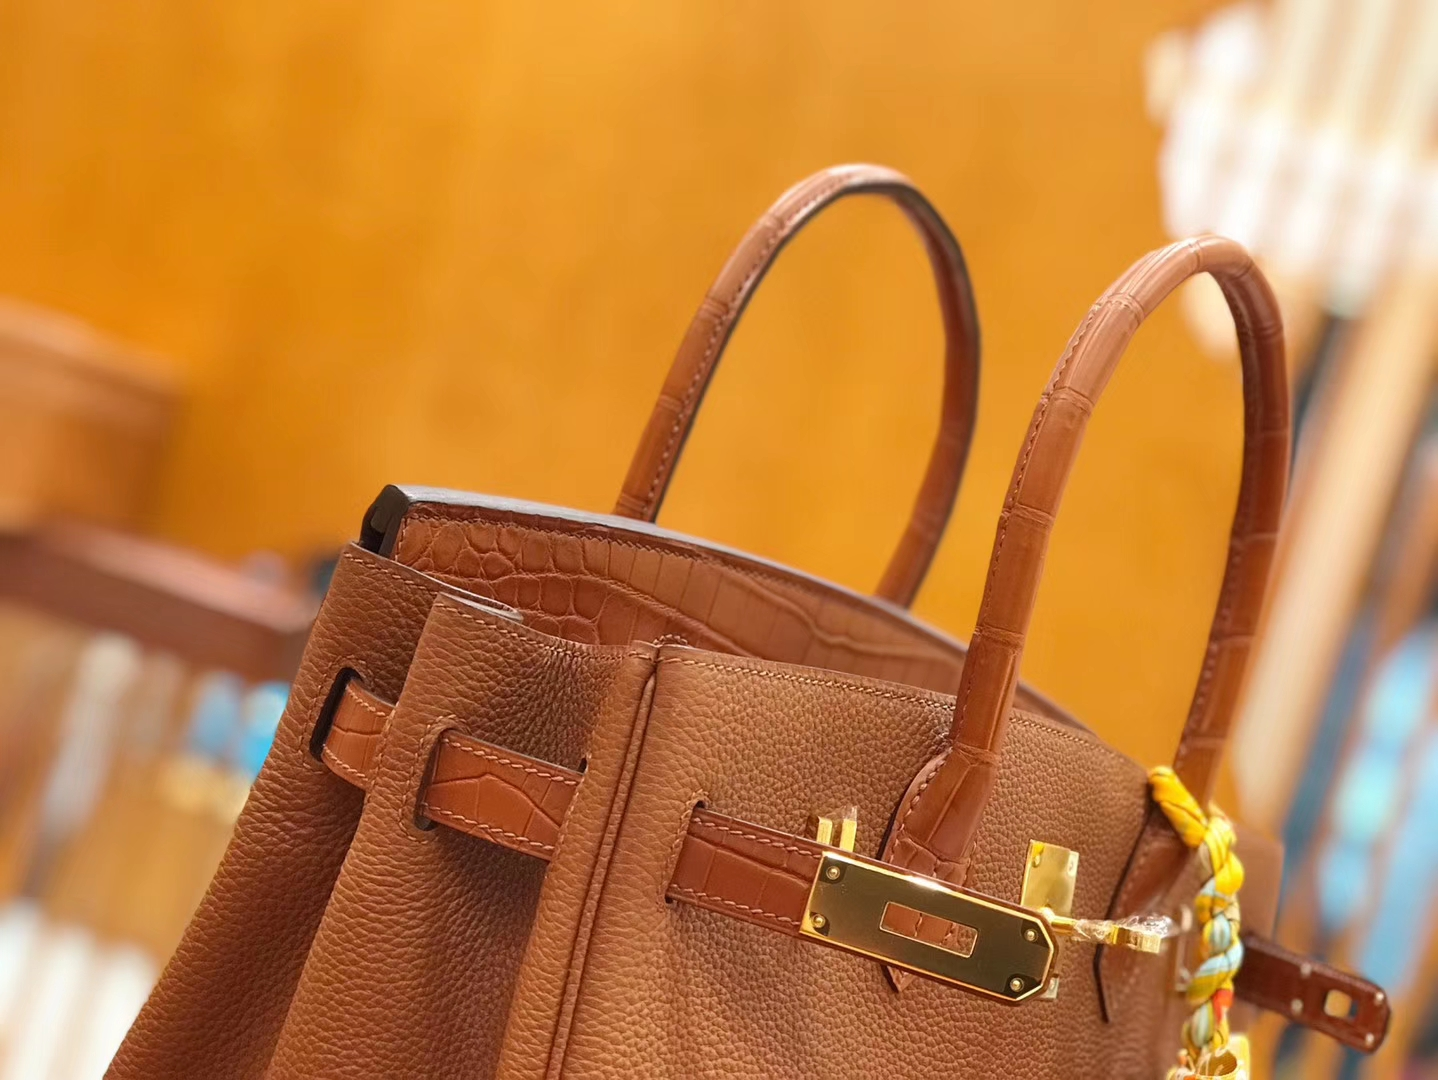 Hermès(爱马仕)Birkin 30cm Touch 蜜糖棕 鳄鱼皮拼牛皮 全手工缝制